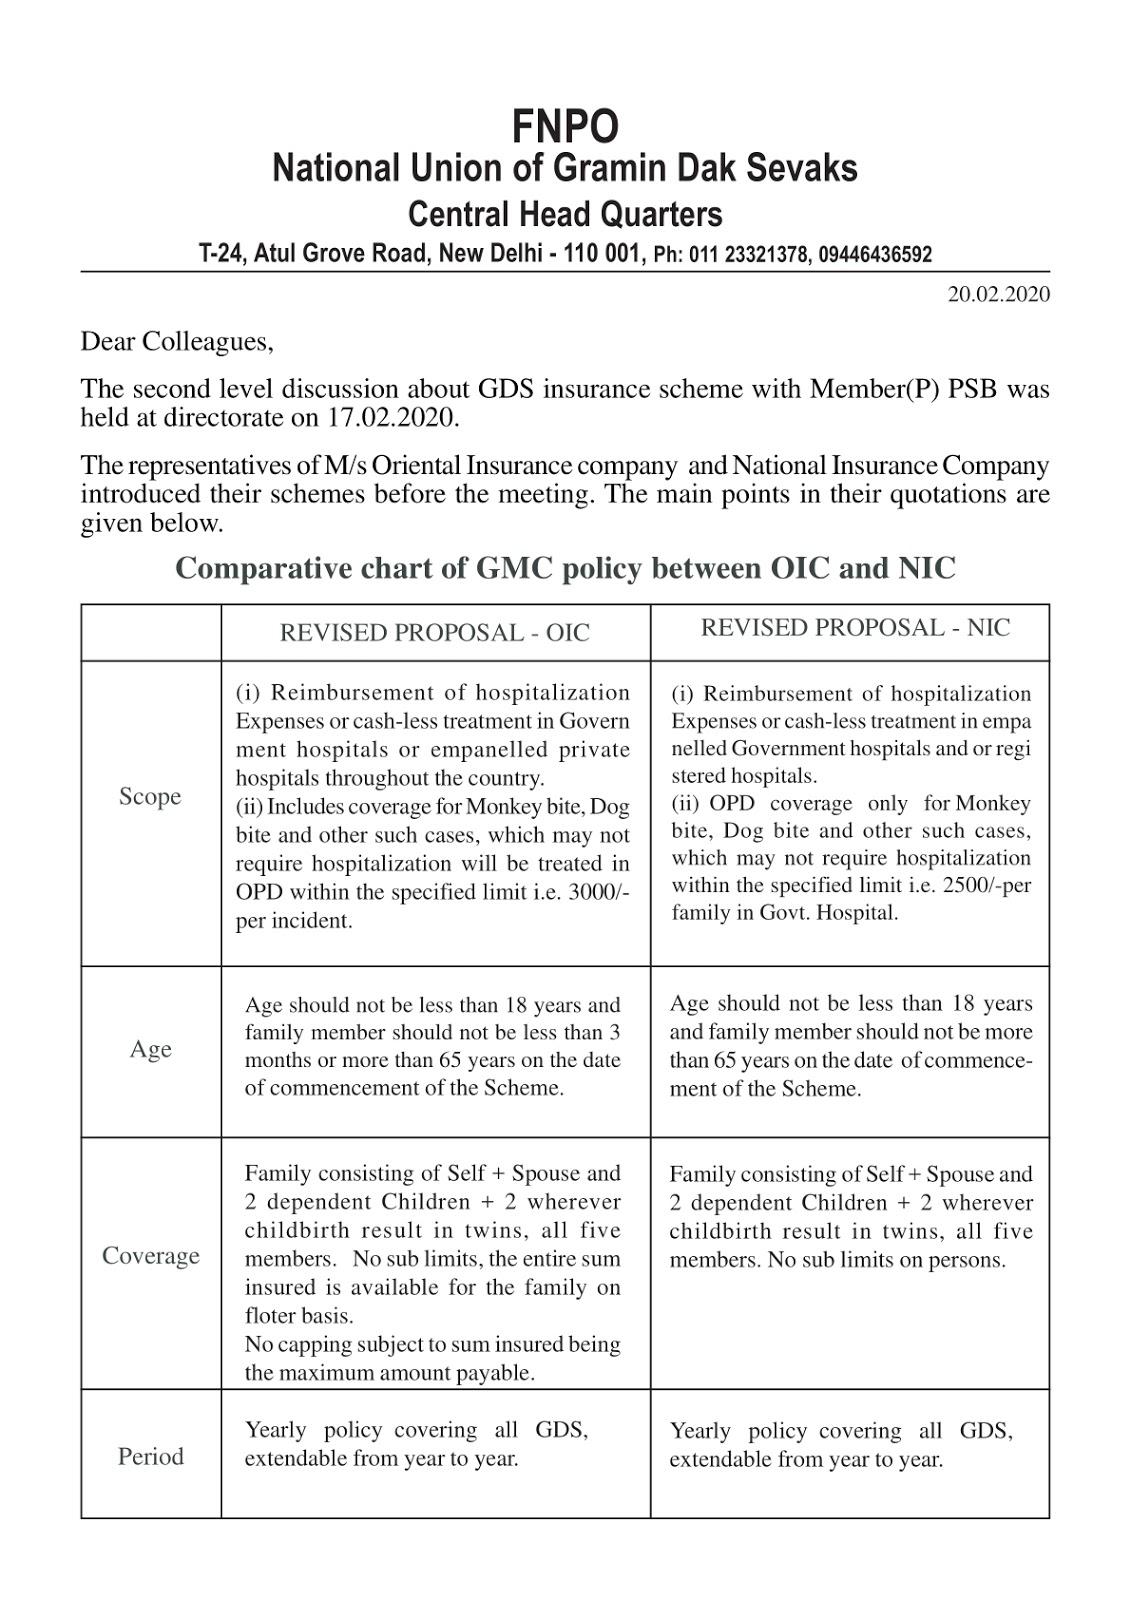 Group Medical Insurance Scheme for GDS - FNPO Letter | SA POST